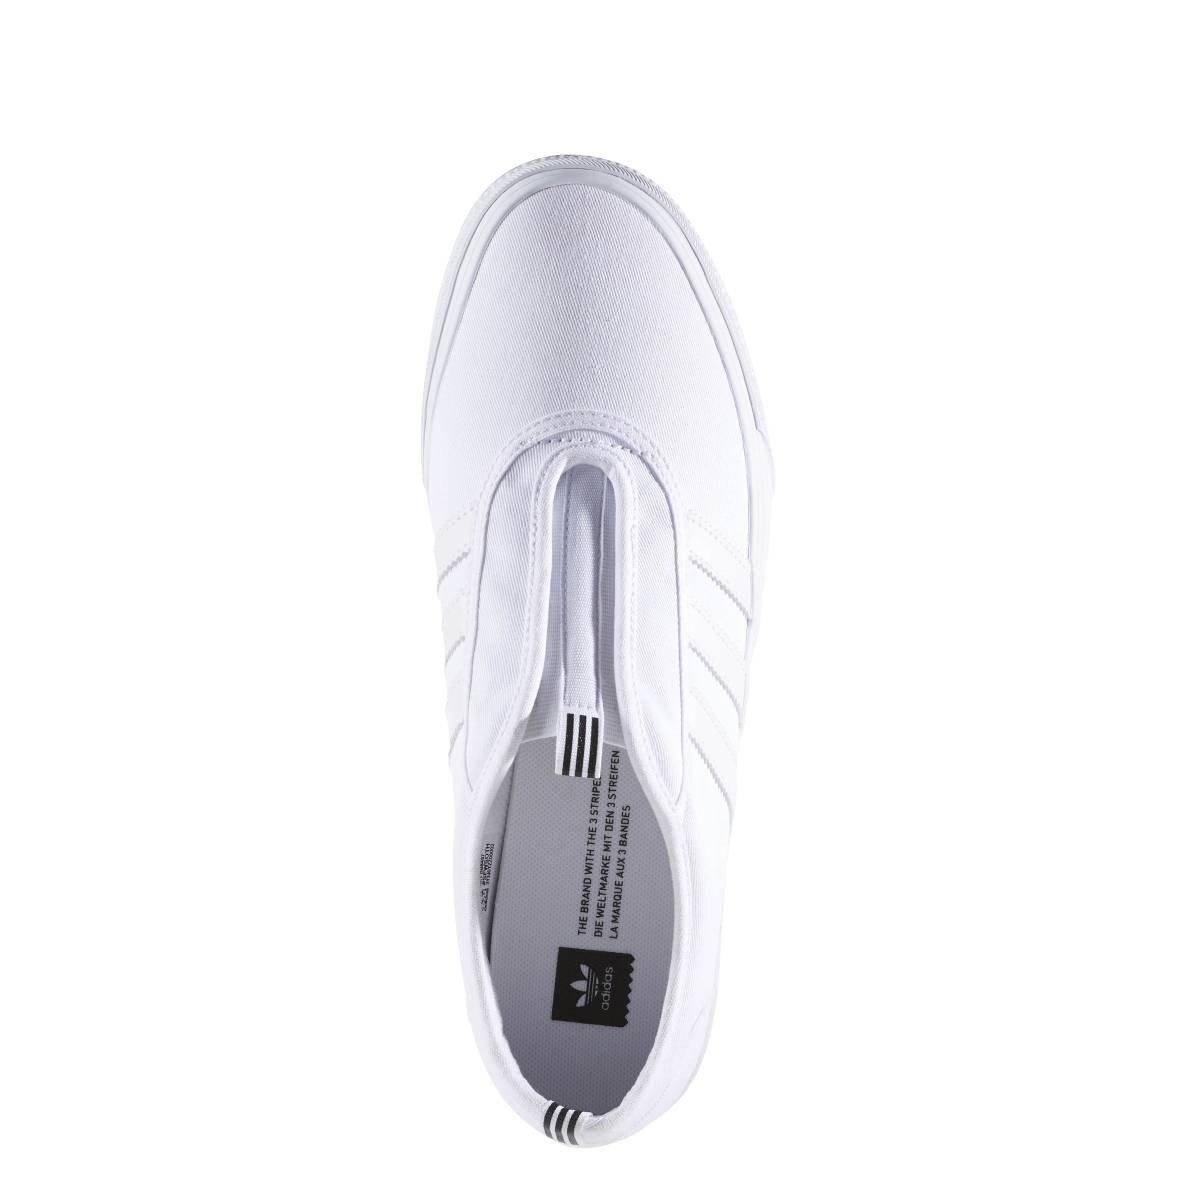 premium selection d1b24 3fdd0 adidas Adi-Ease Kung-Fu, Scarpe da Ginnastica Uomo, Bianco (FtwblaNegbas),  41 13 EU Amazon.it Scarpe e borse